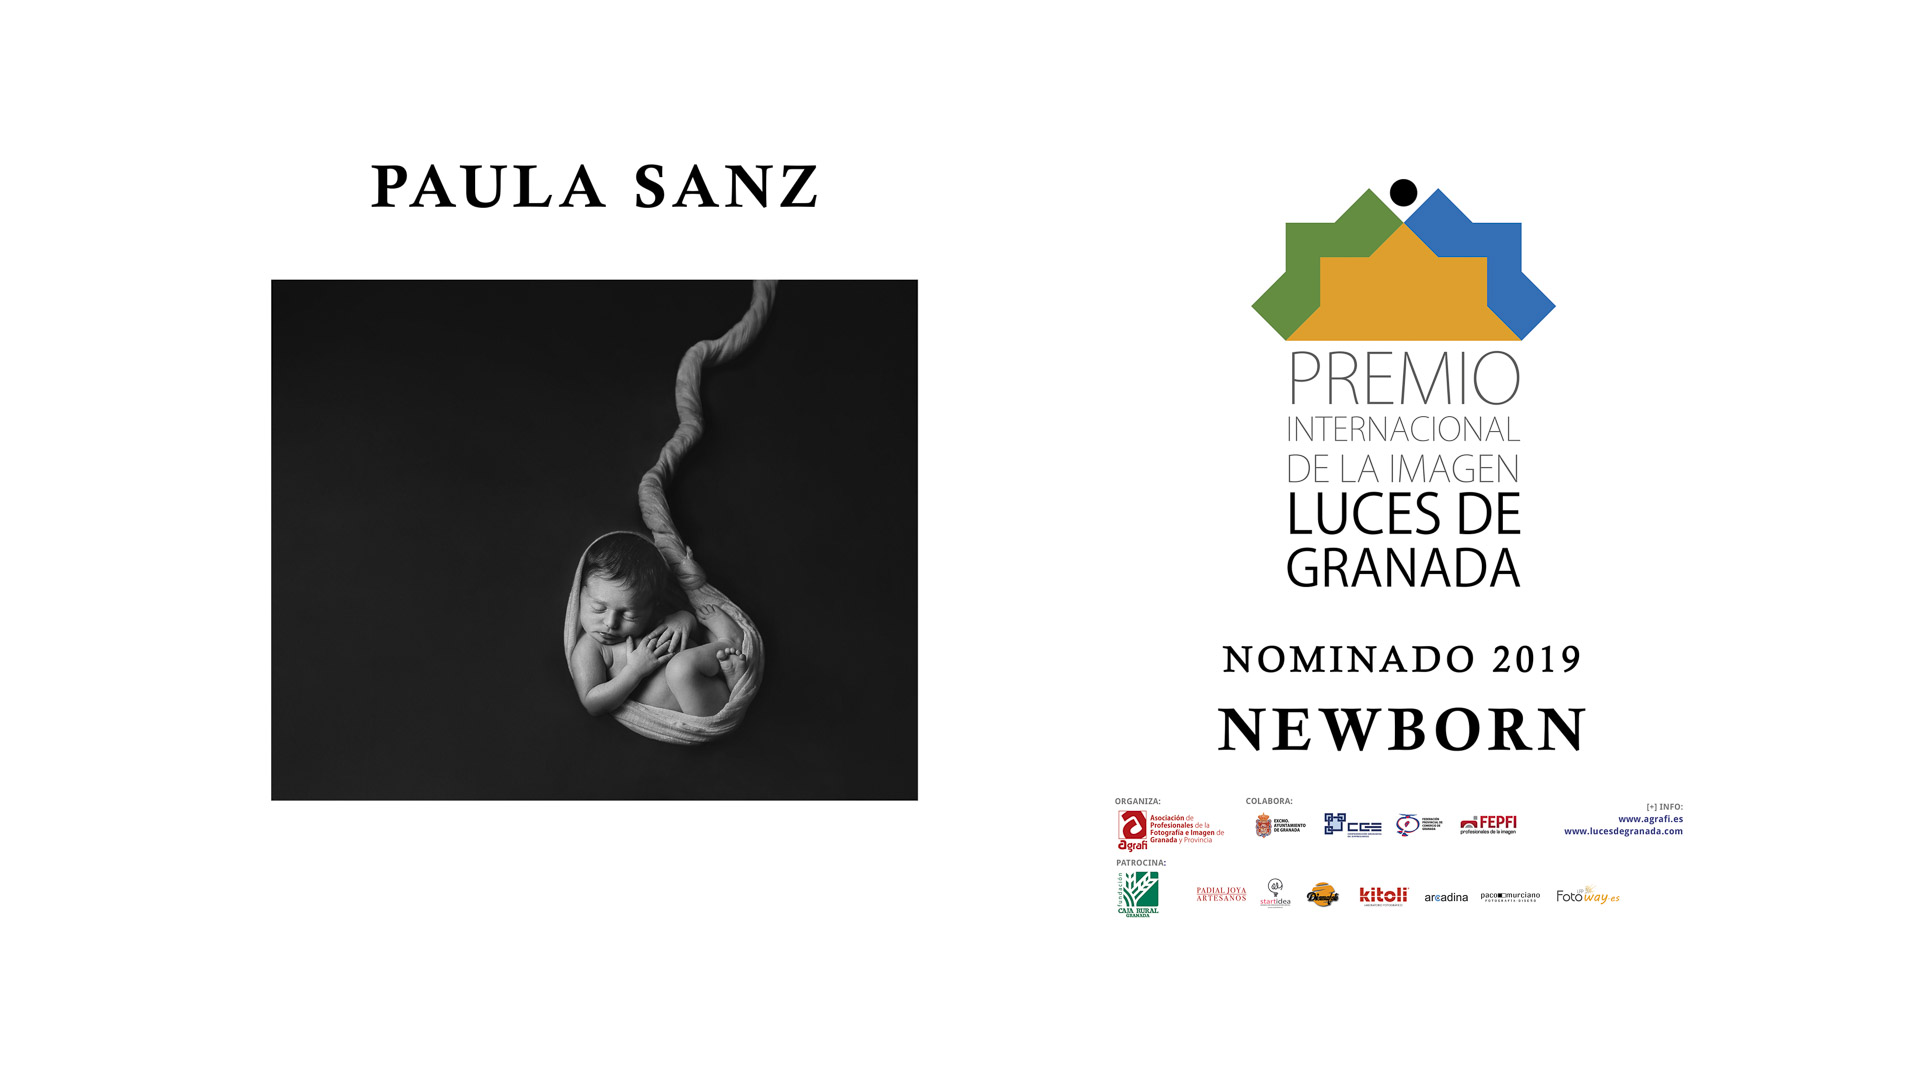 NB10_PAULA SANZ